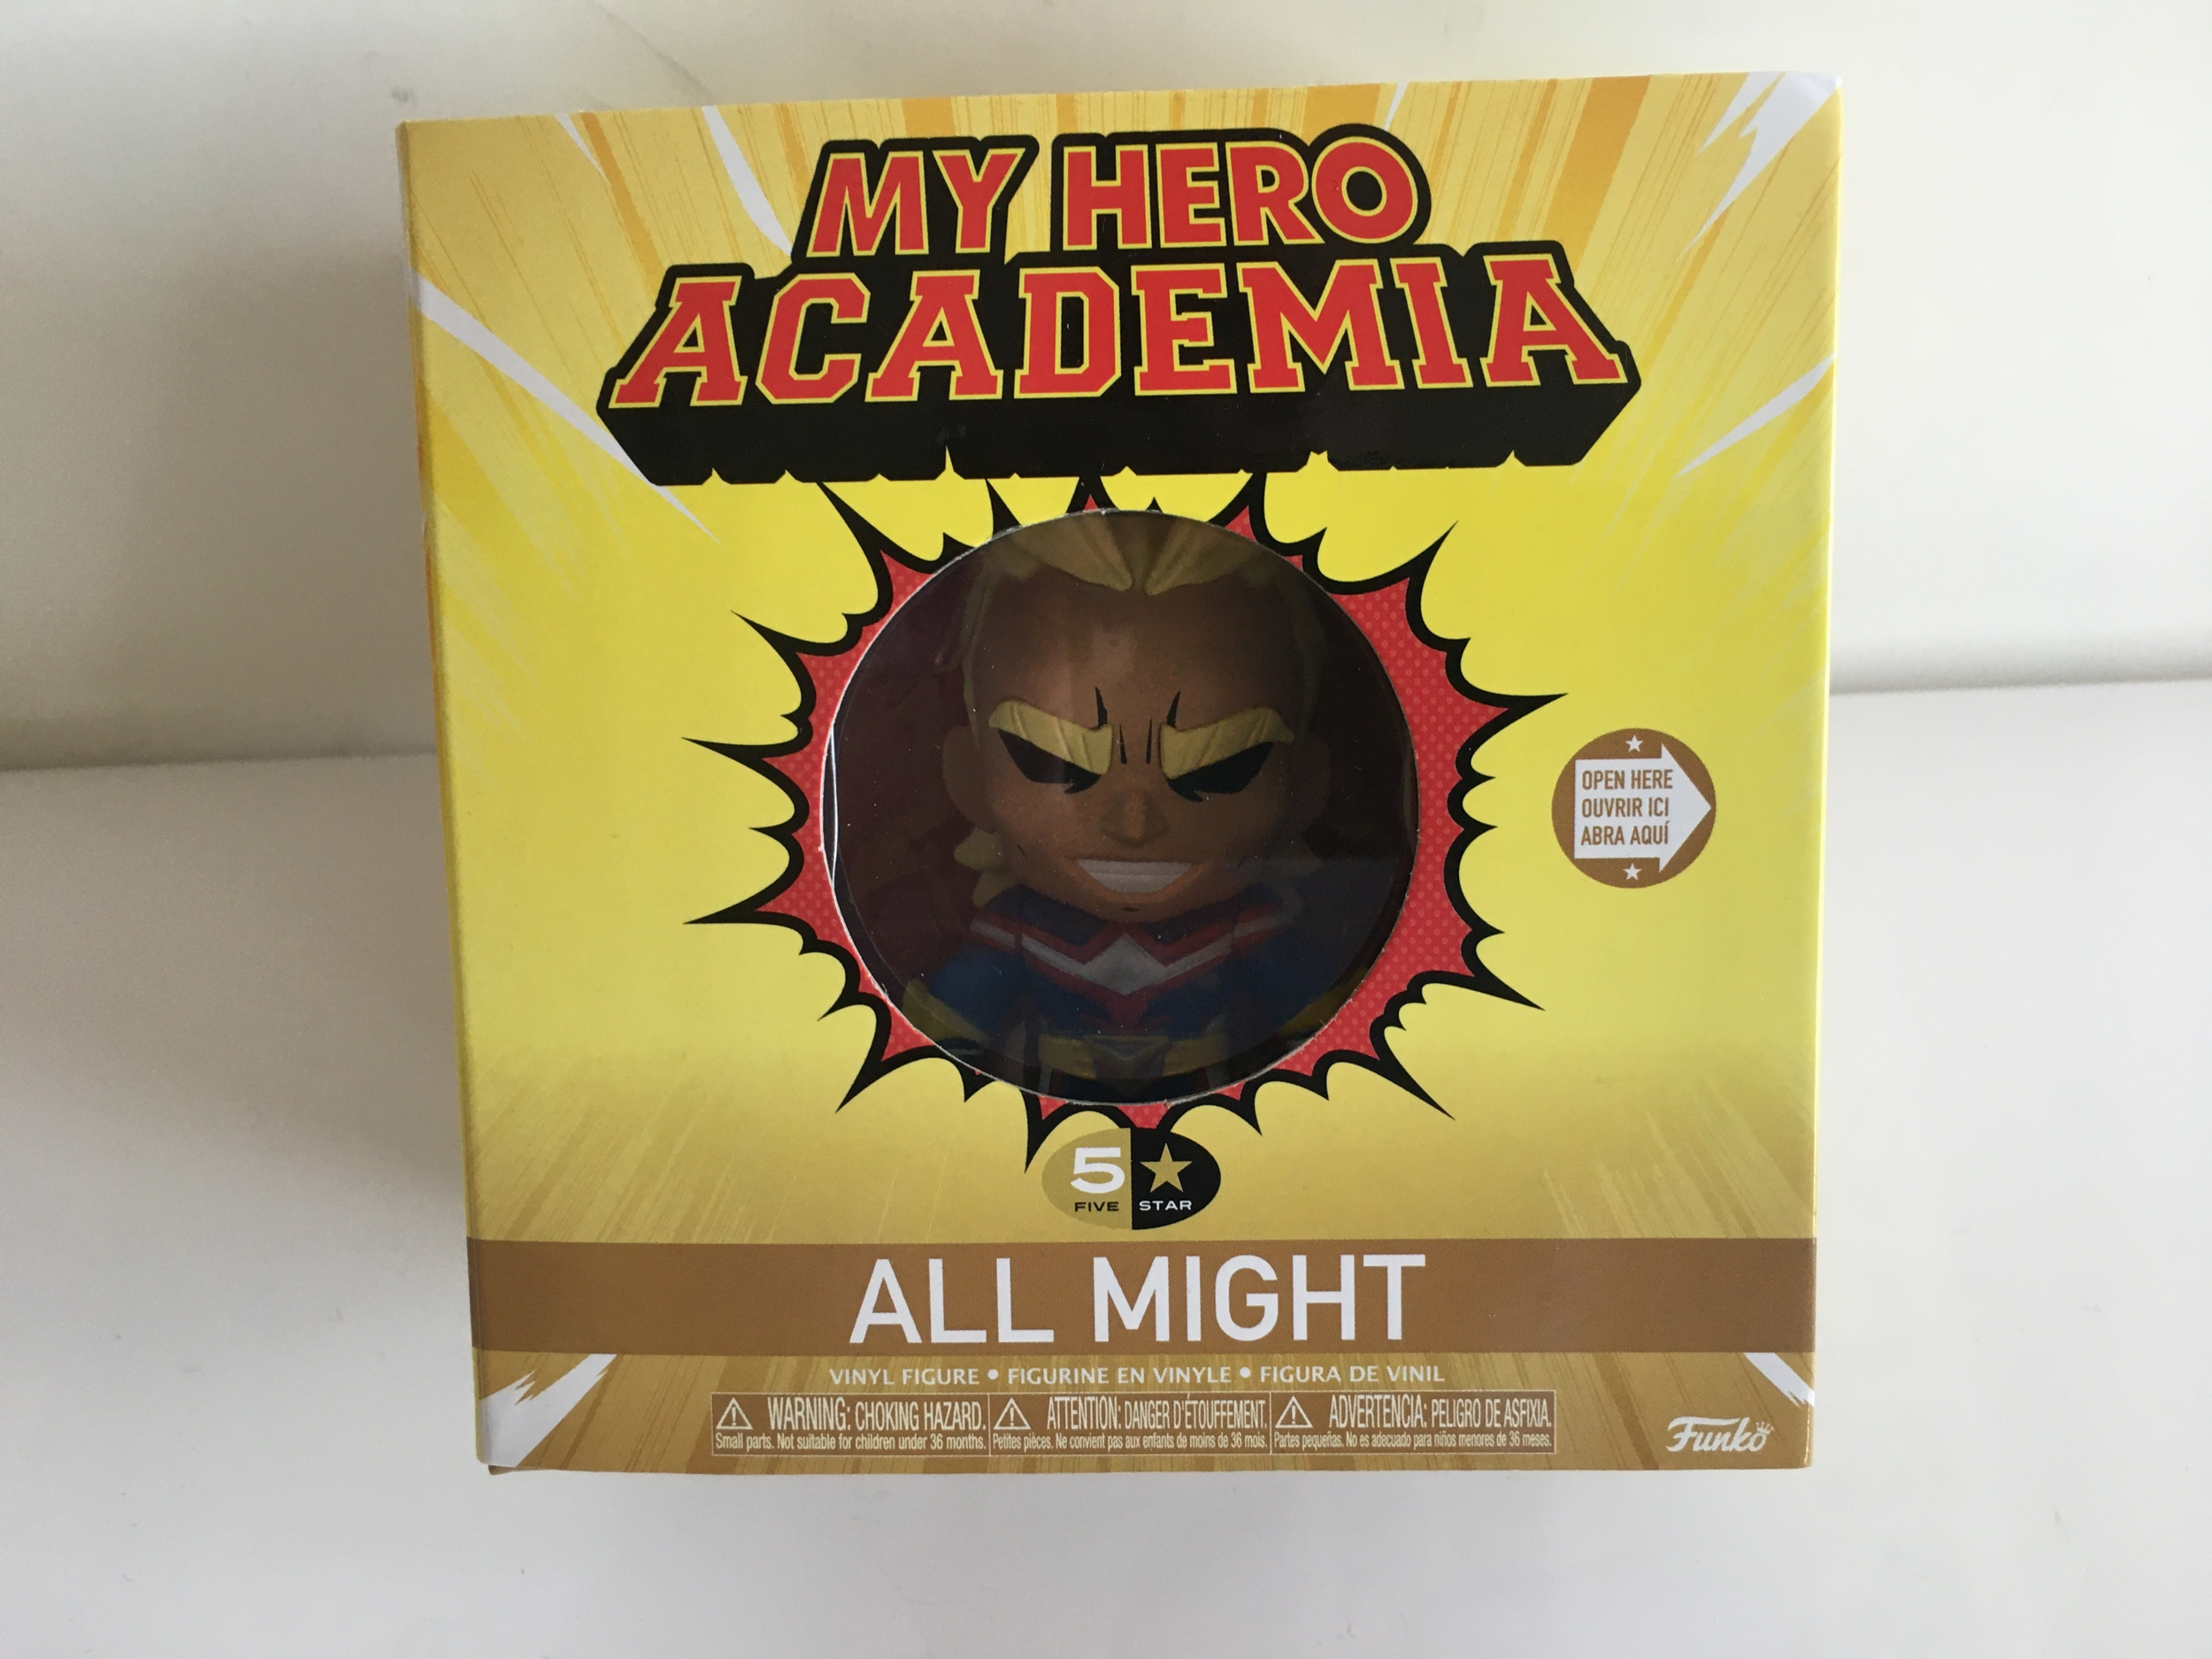 My Hero Academia - Figurine 5 Star : All-Might